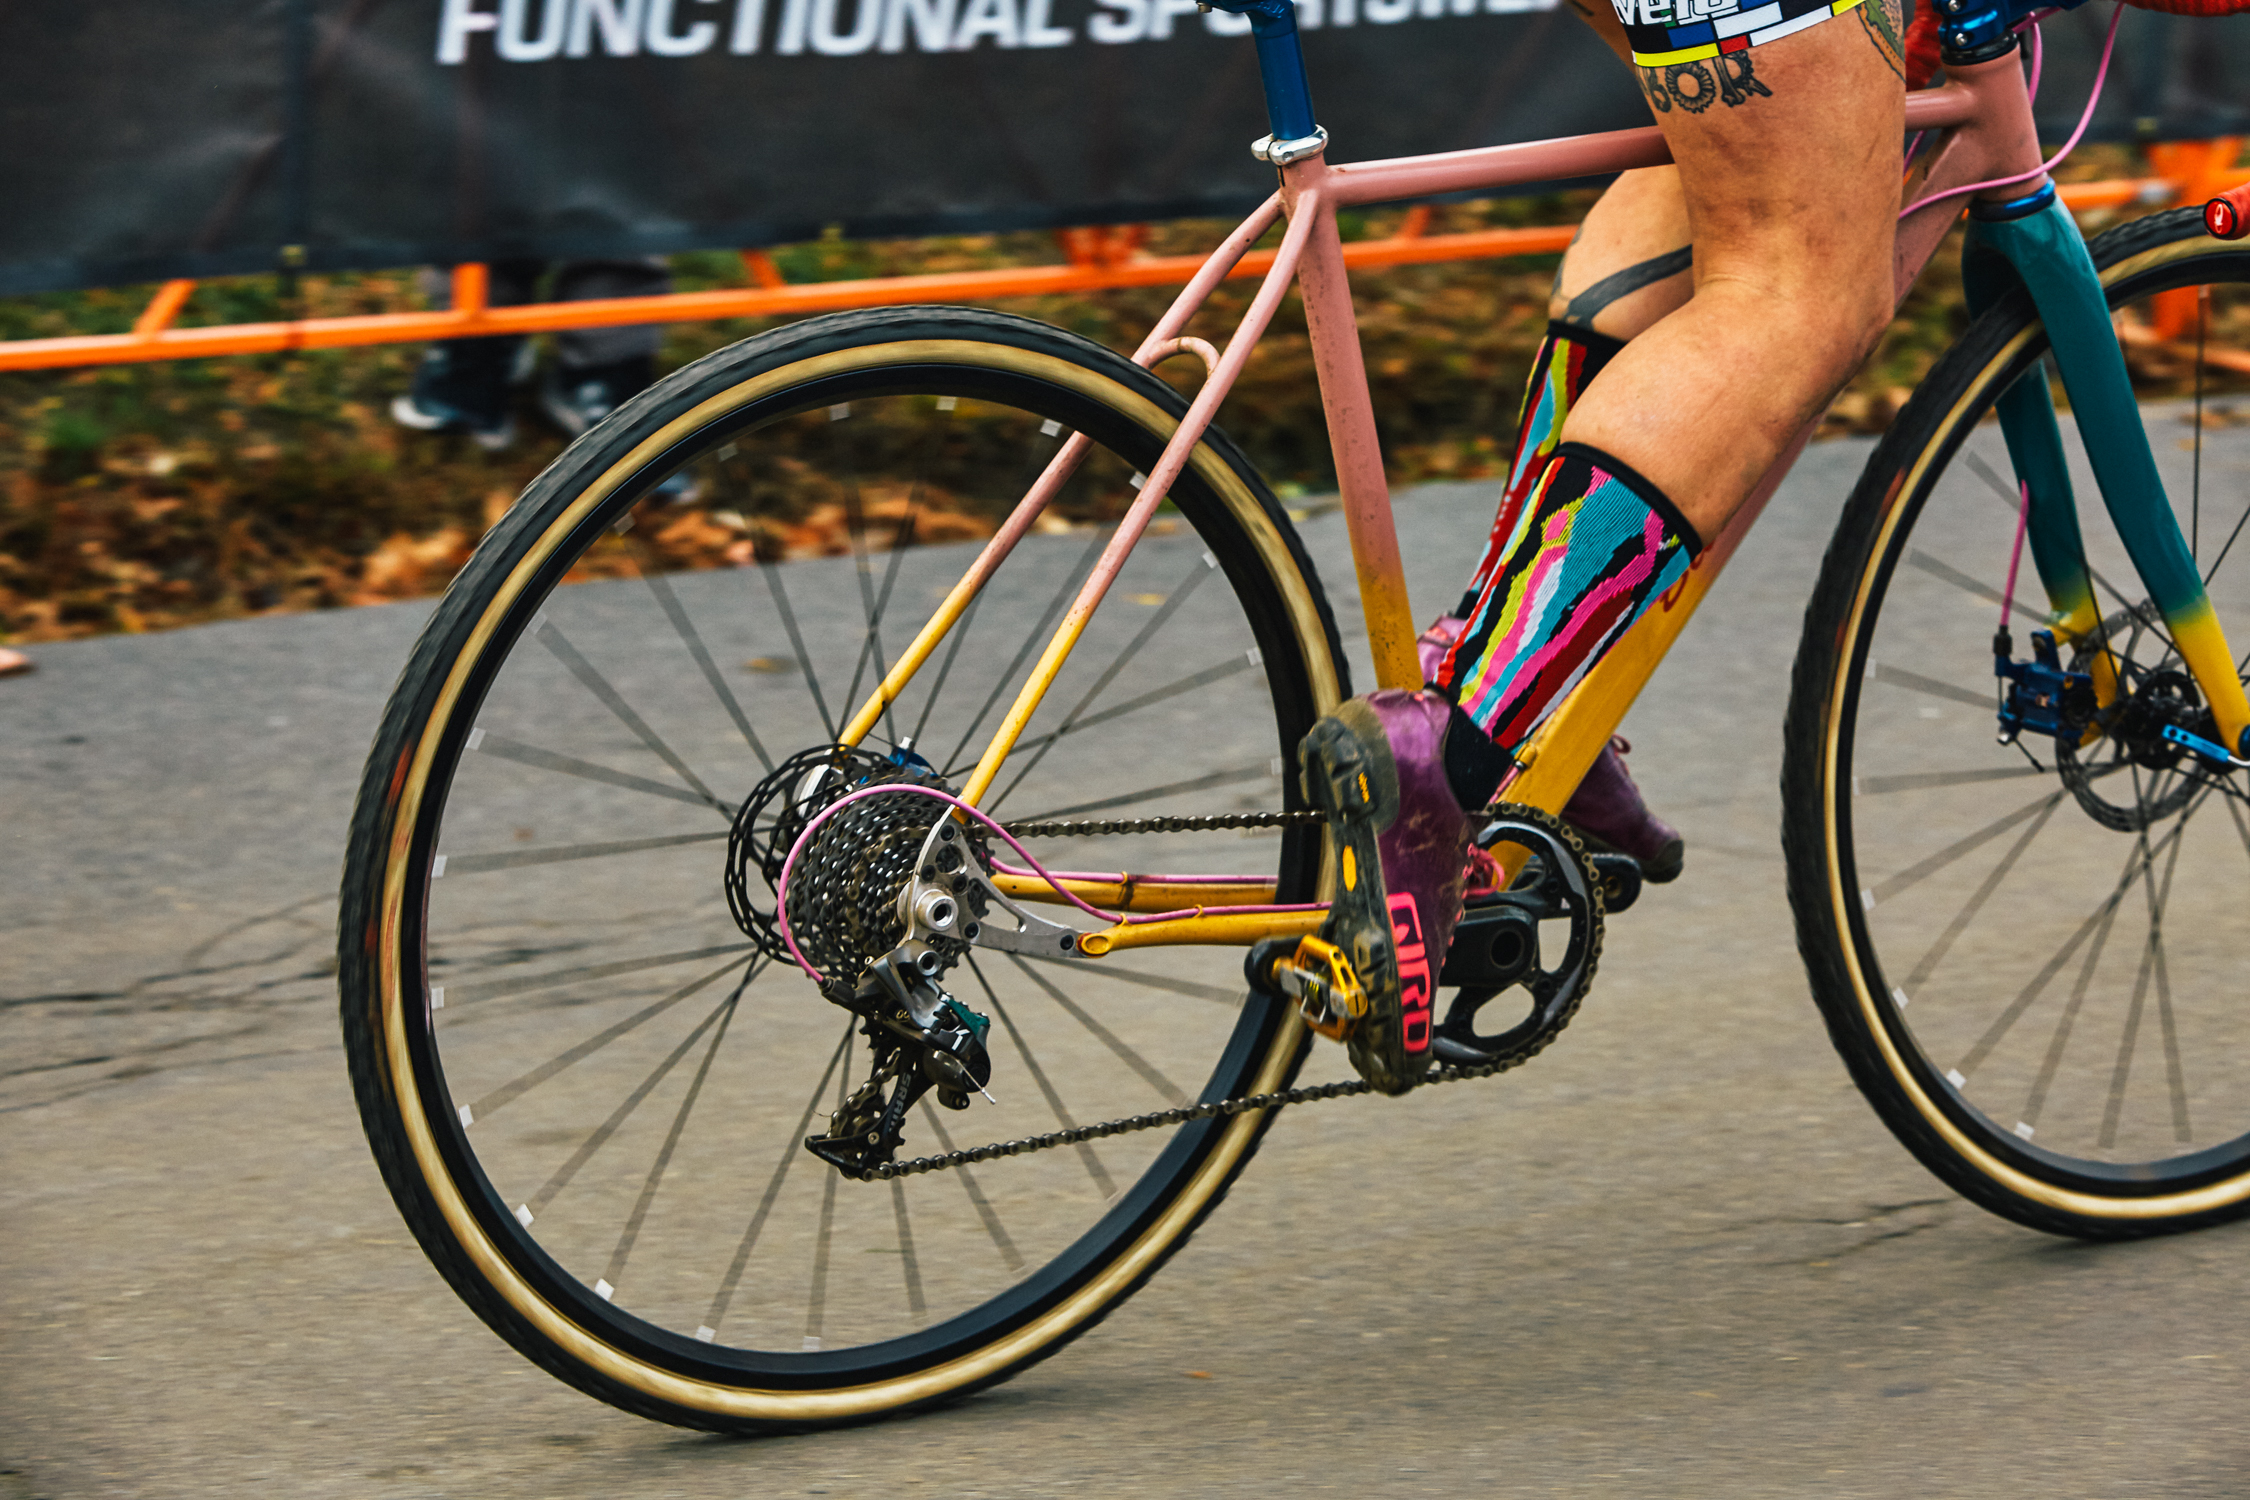 cyclocross_9.jpg